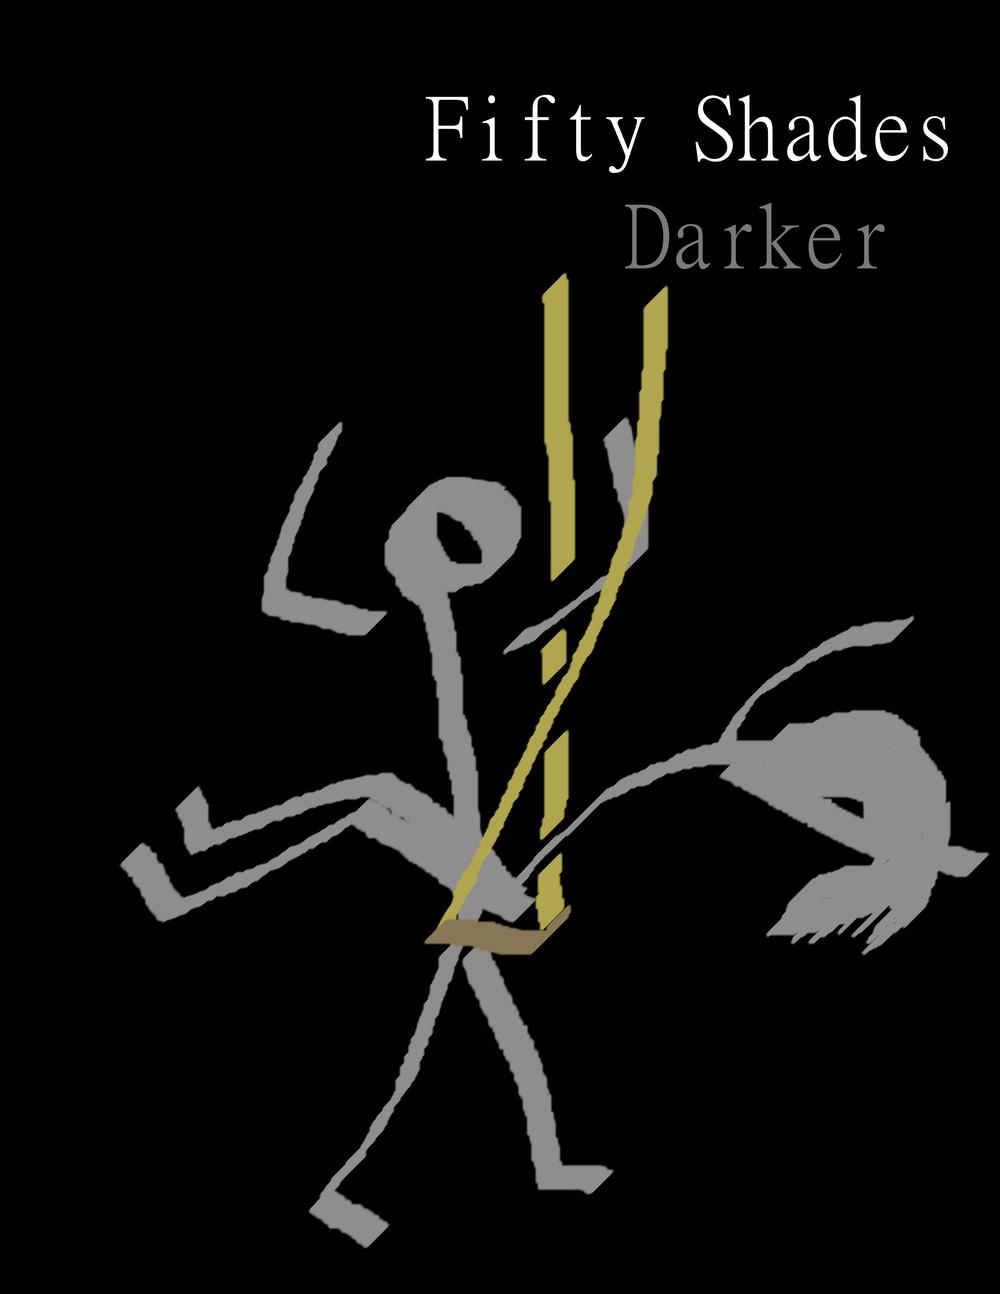 50 Shades Darker by E J Lames